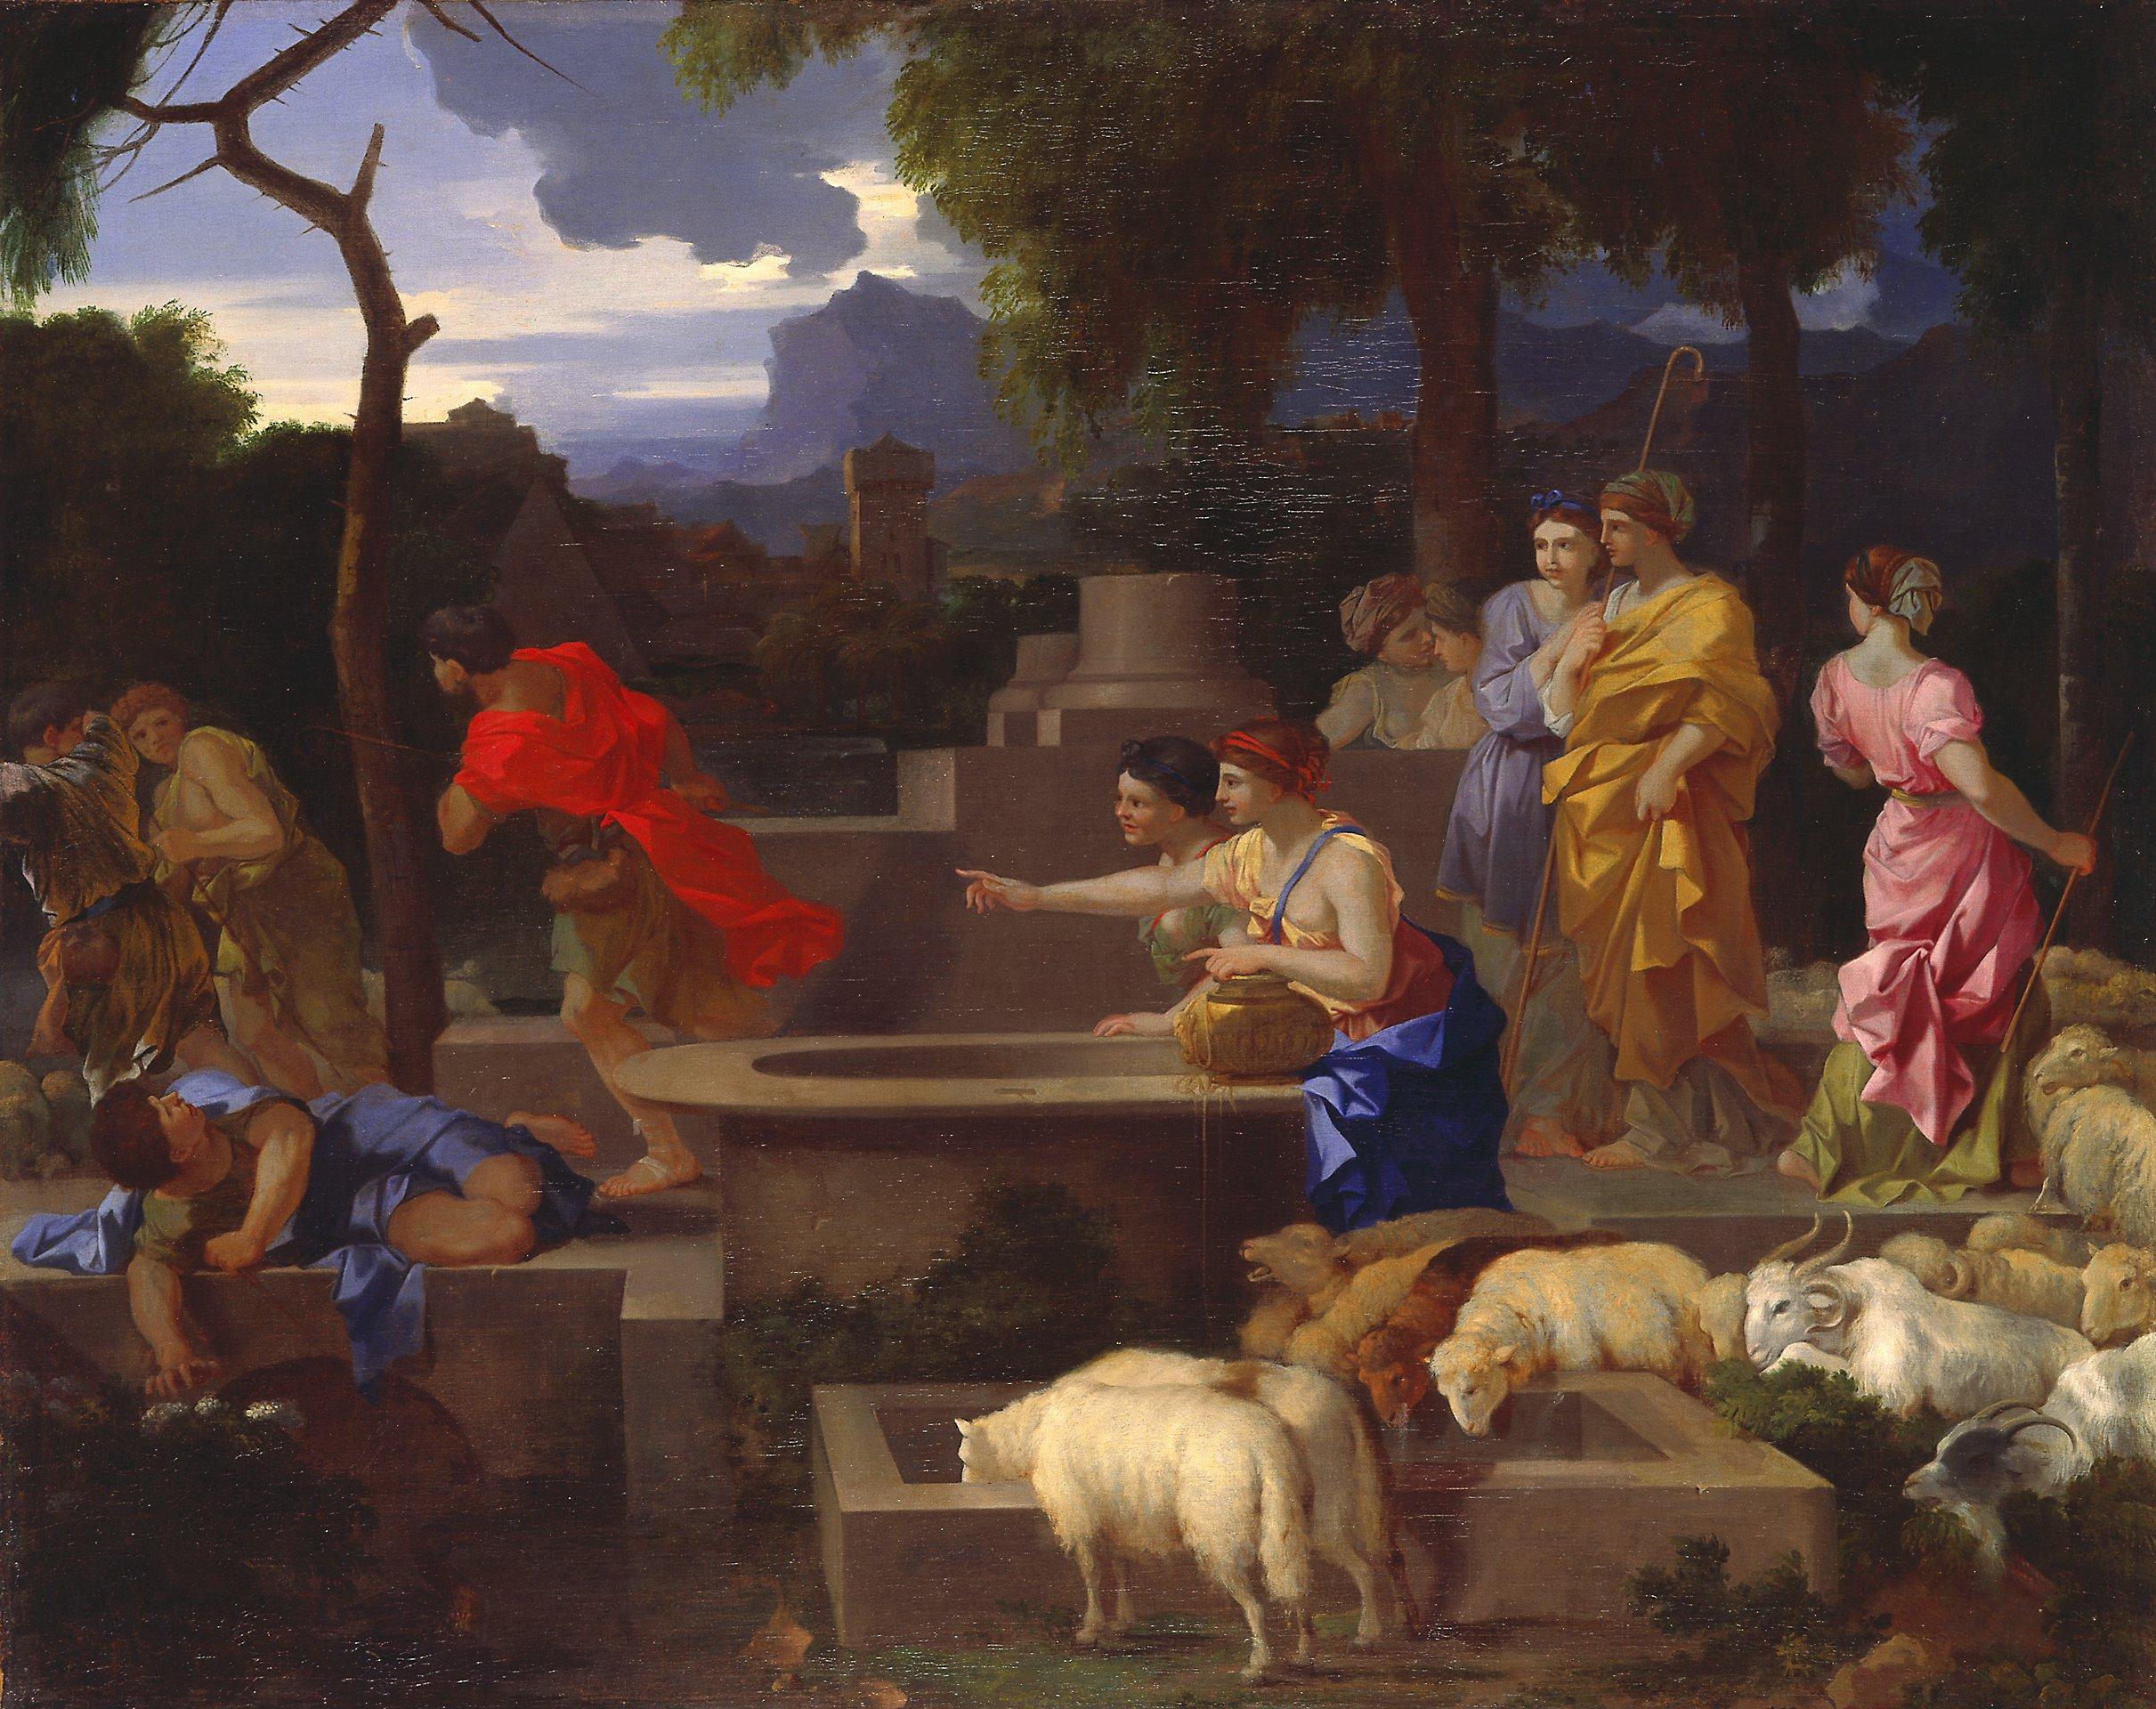 Sbastien Bourdon, Moses Defending the Daughters of Jethro